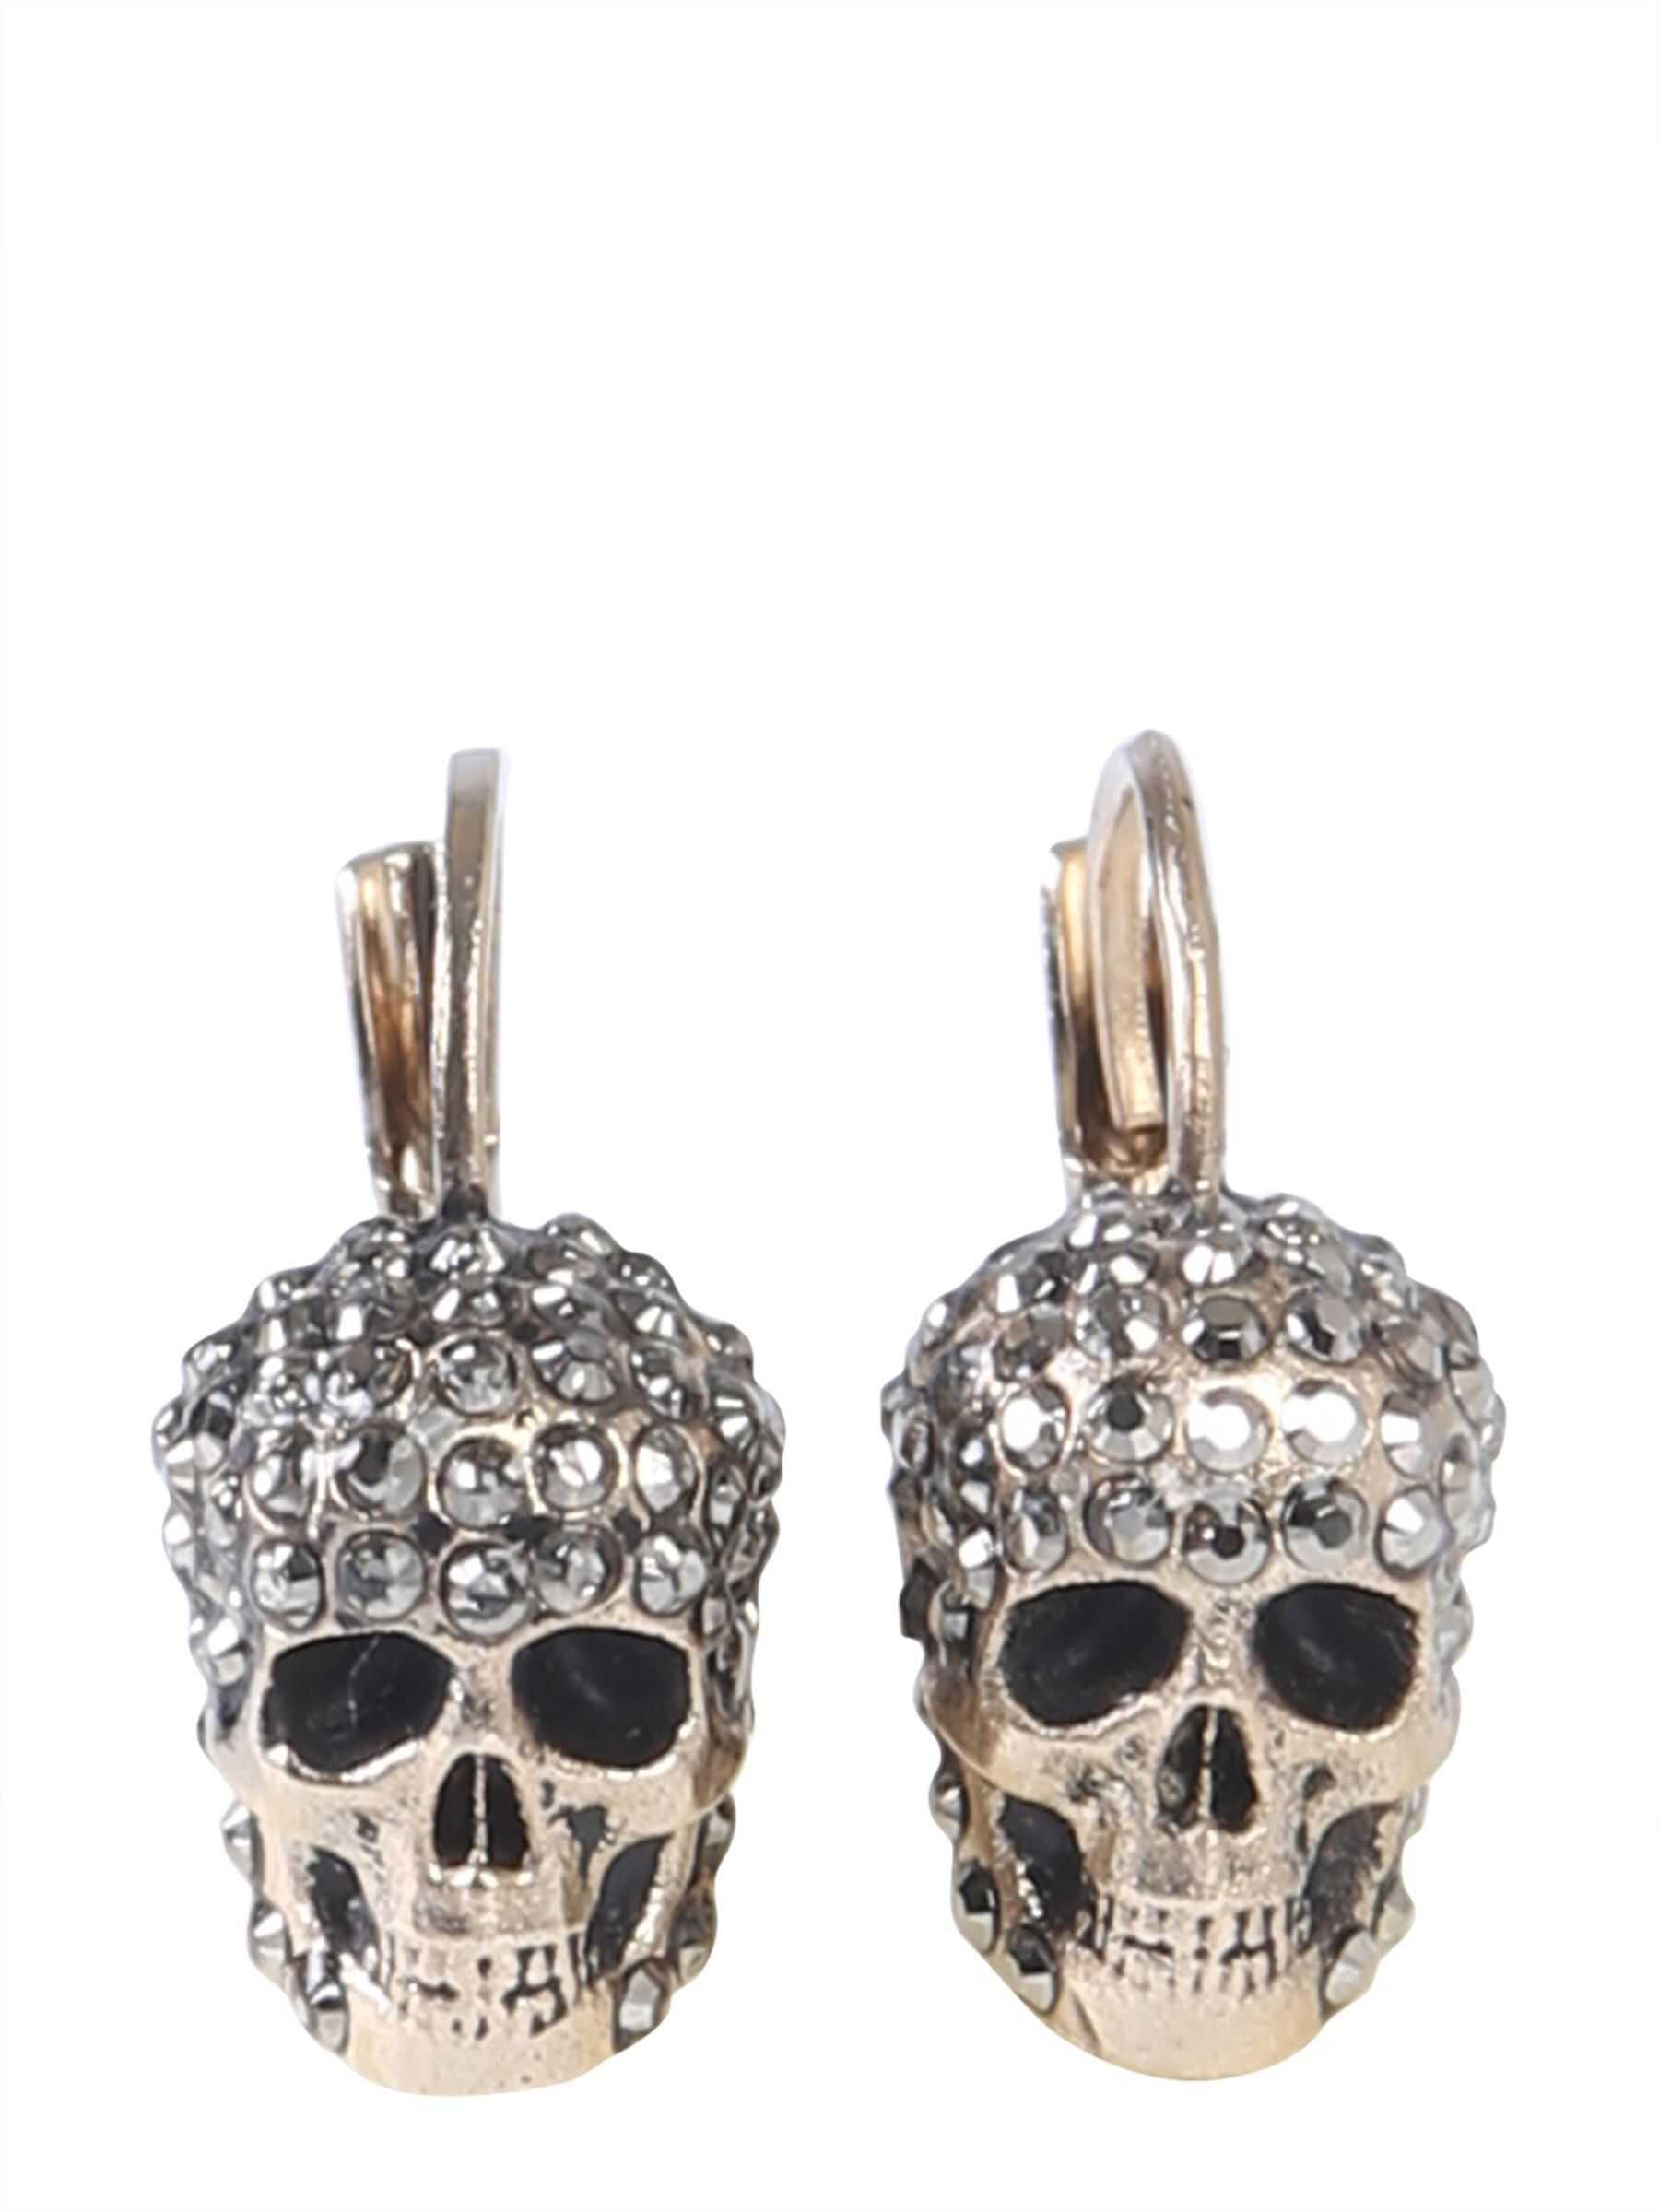 Alexander McQueen Skull Earrings GOLD